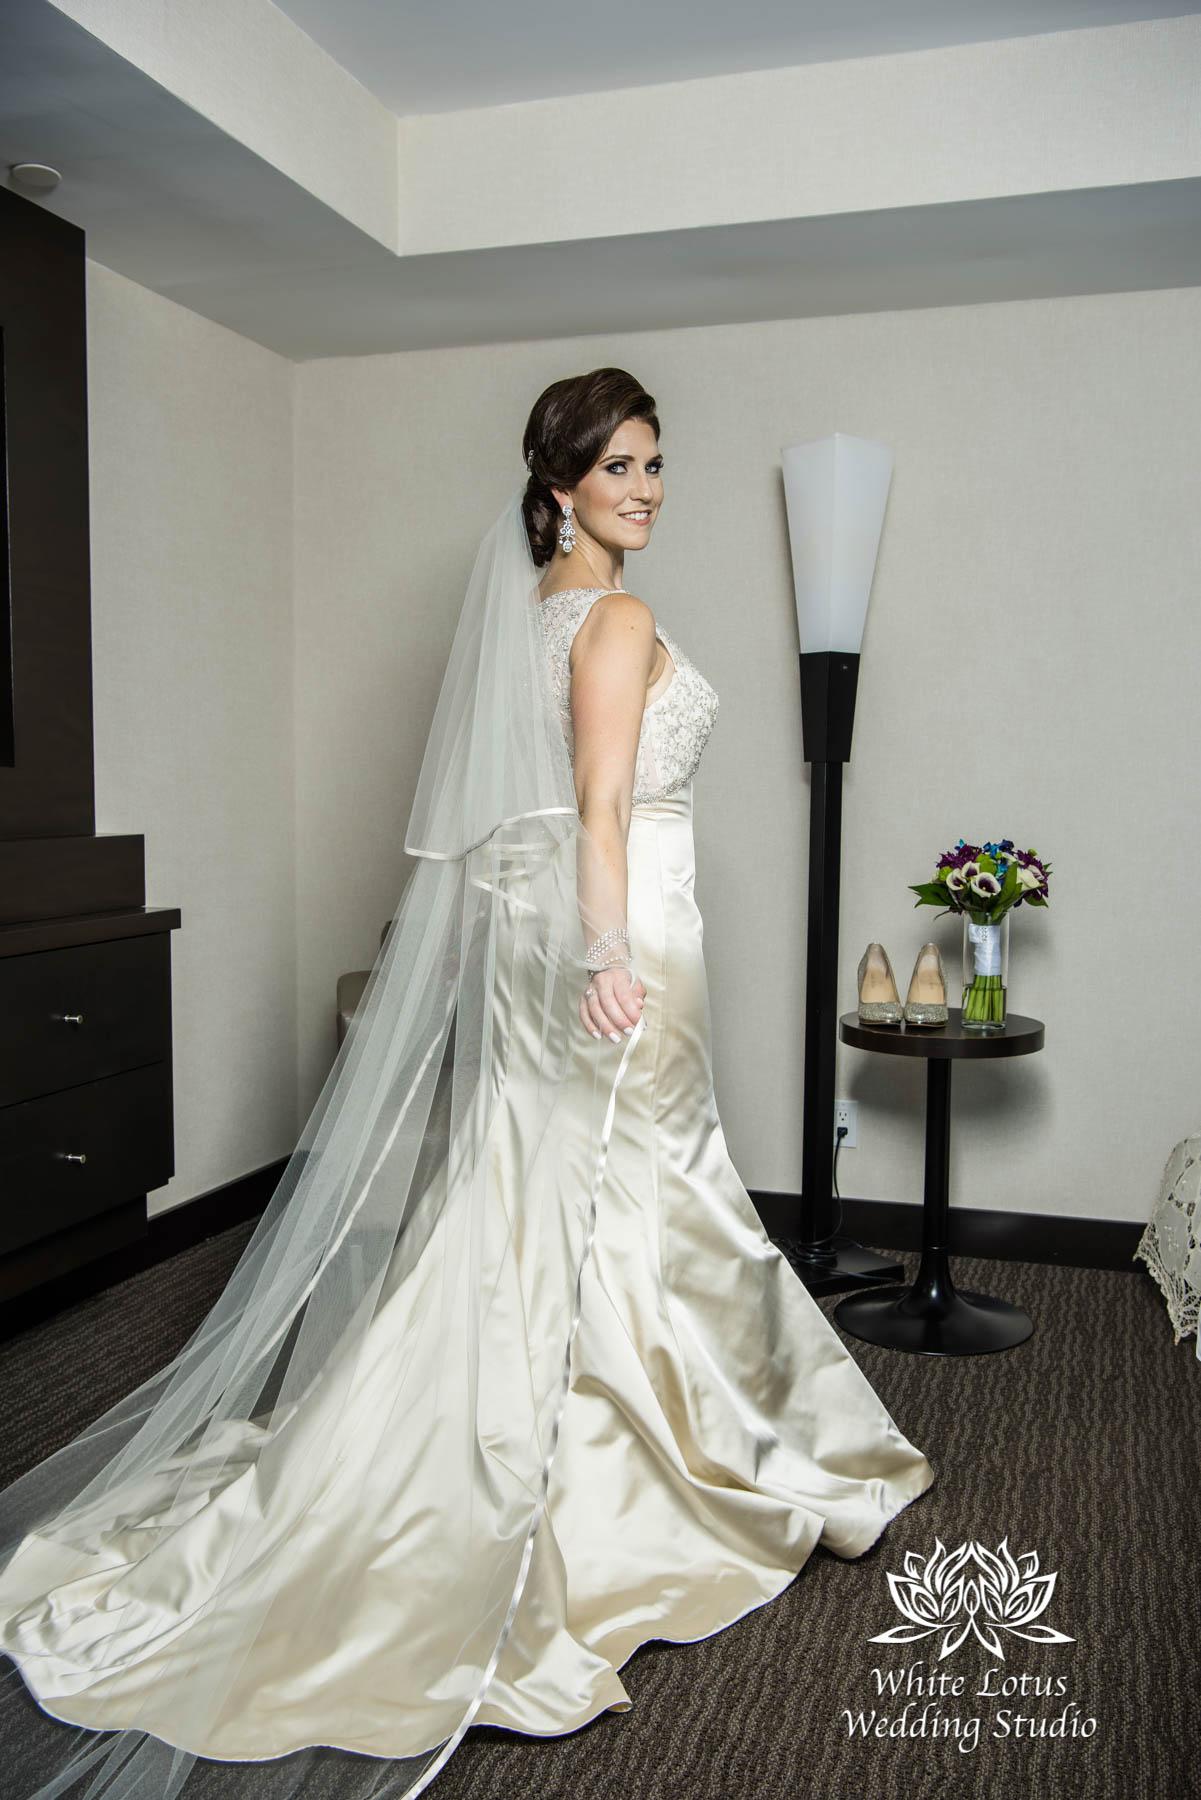 058 - Wedding - Toronto - Bride getting ready - PW